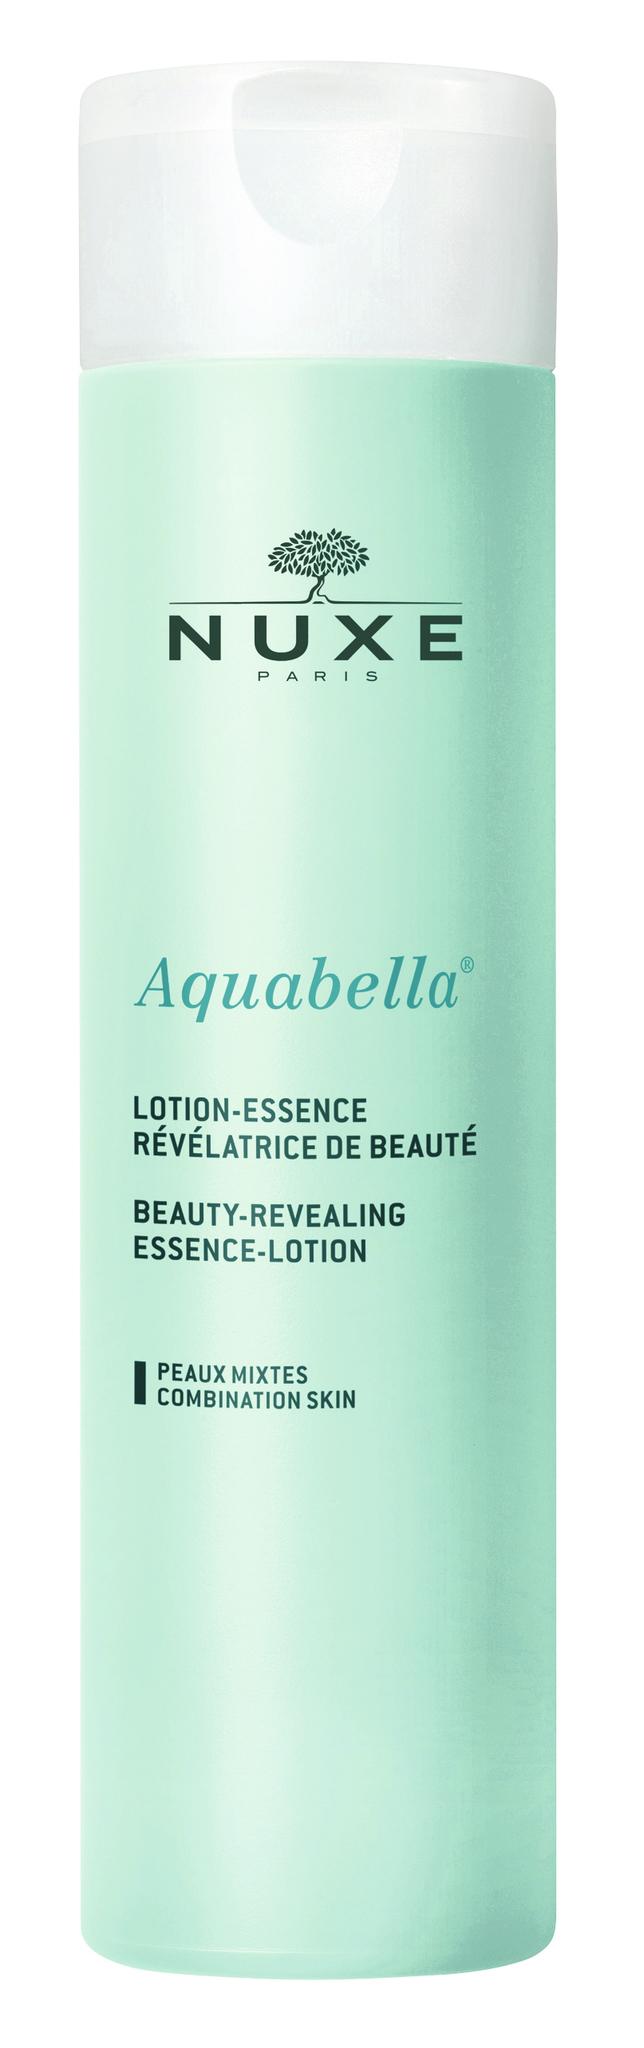 Nuxe - Aquabella Pore Minimizing Lotion 200 ml